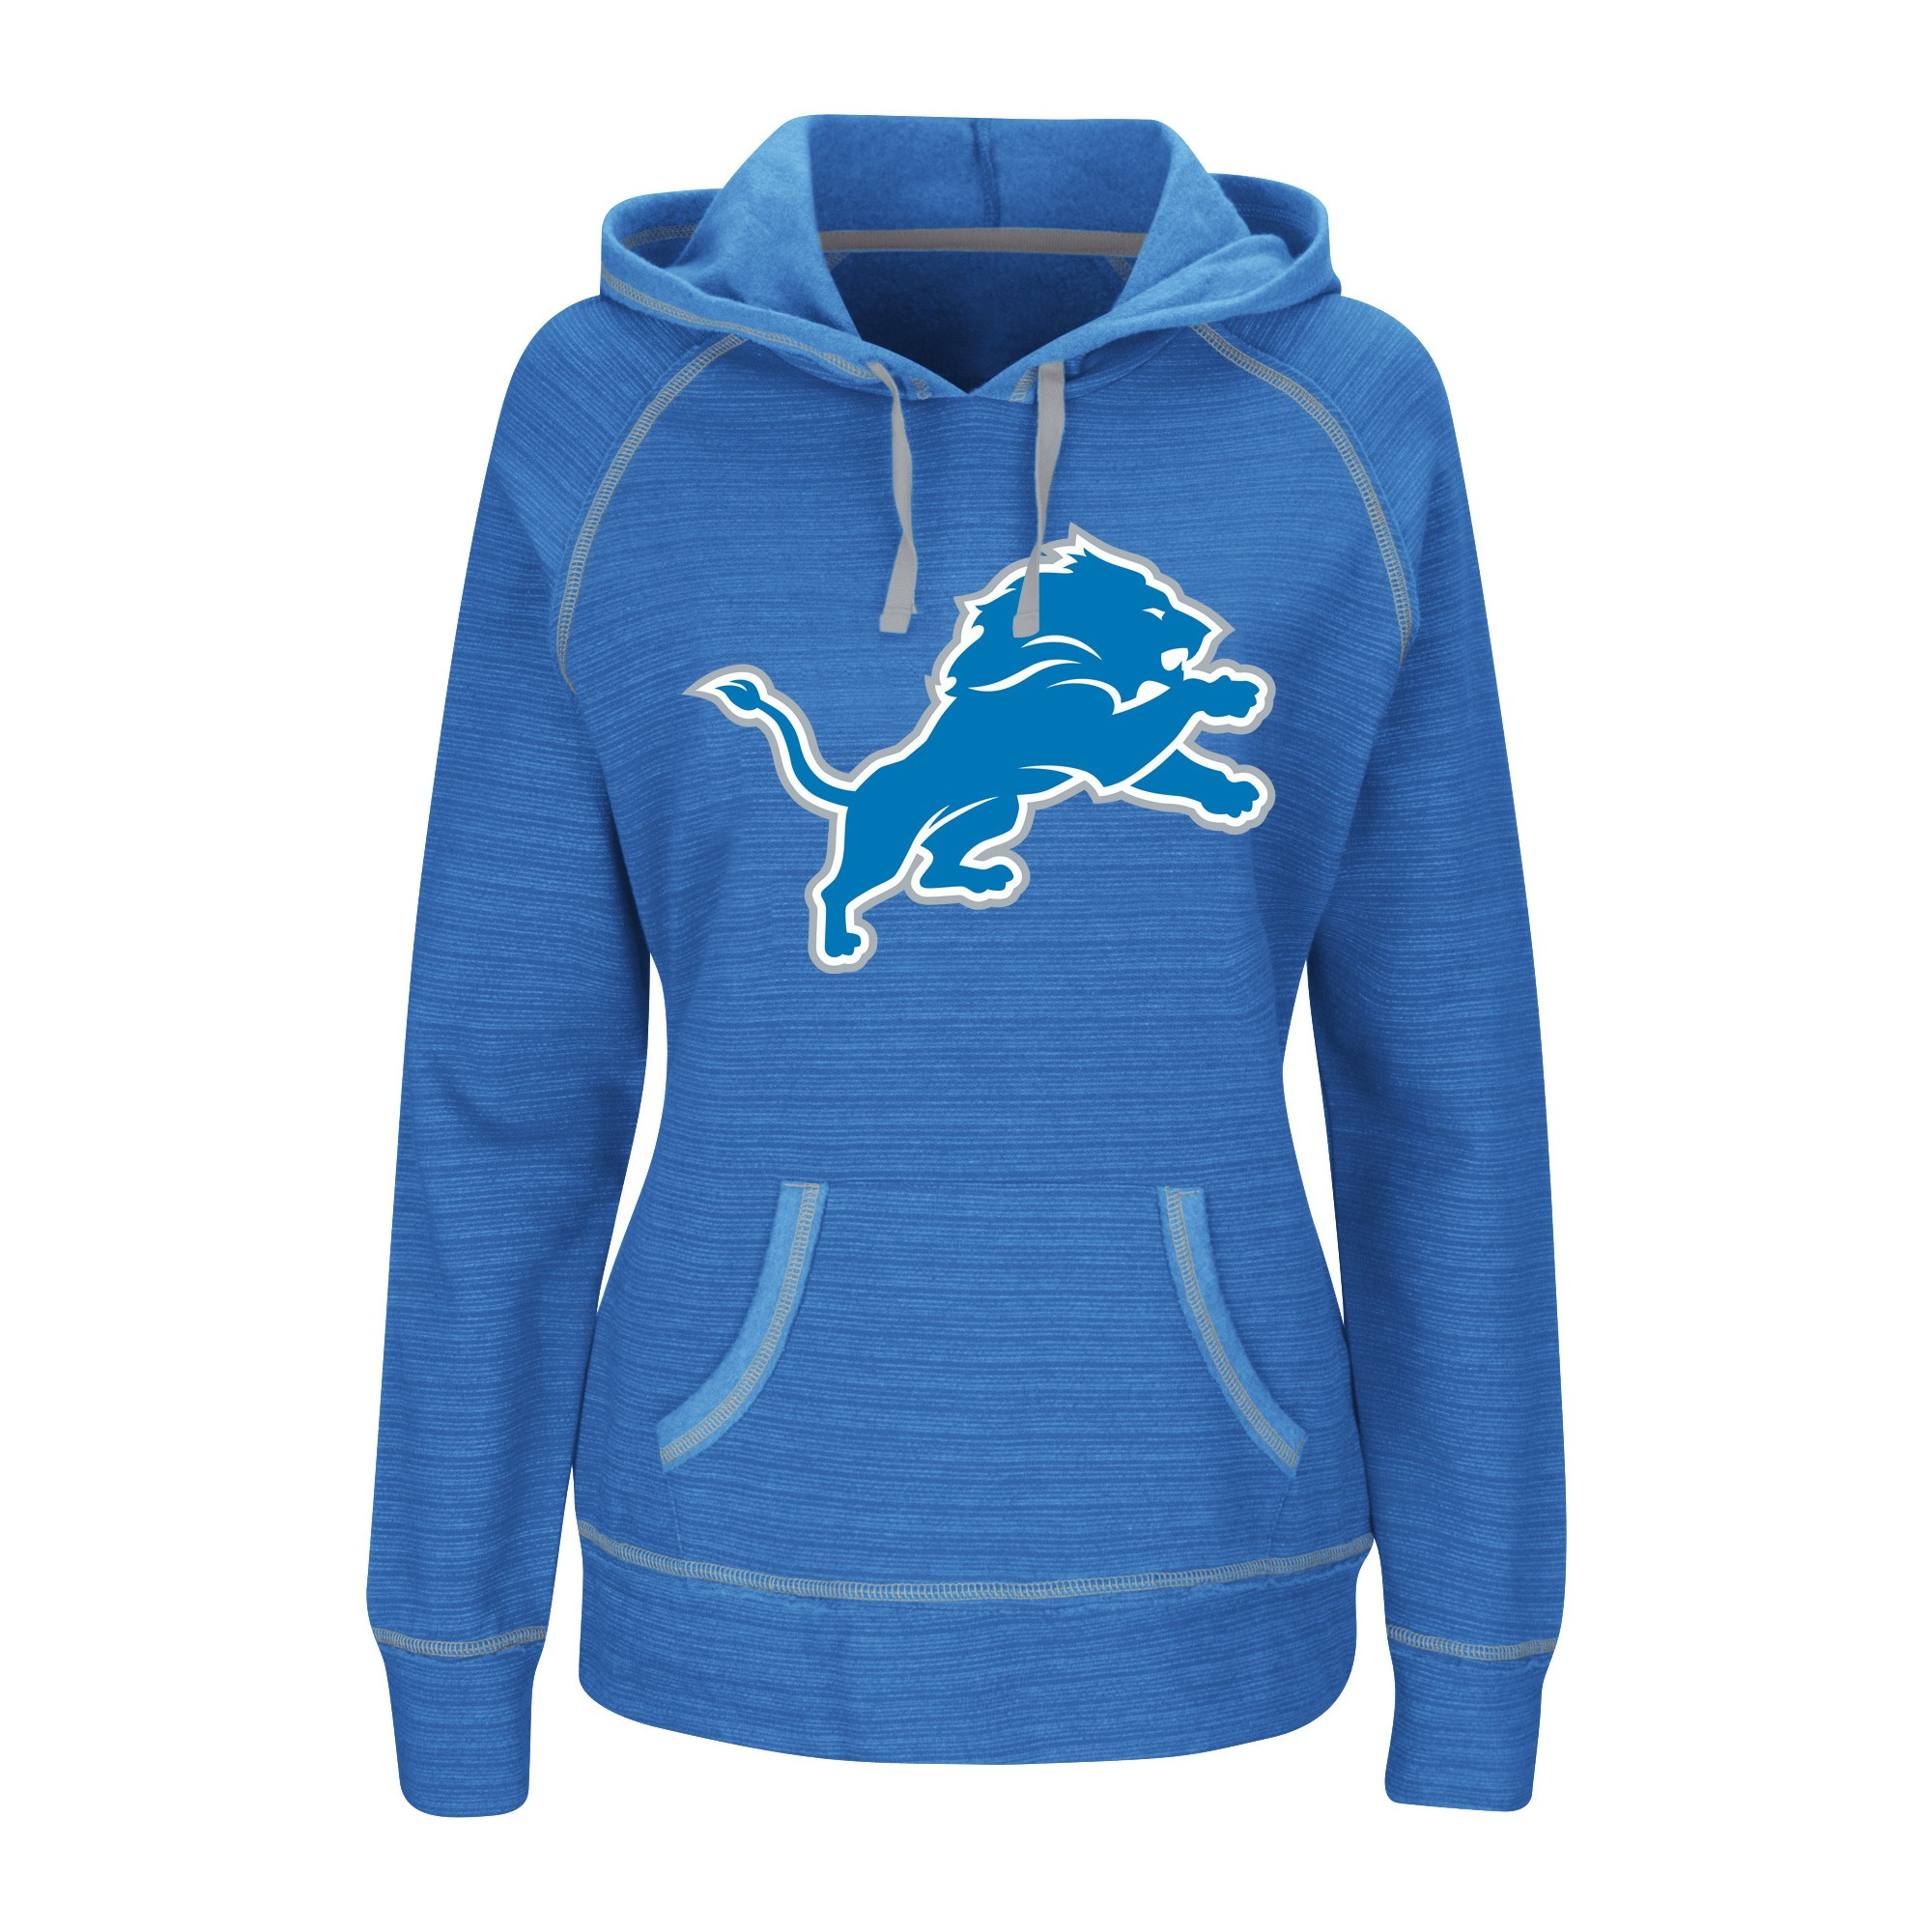 lowest price 1ef4e 25eb2 Detroit Lions Sweatshirt Xxl, Women's, Multicolored ...